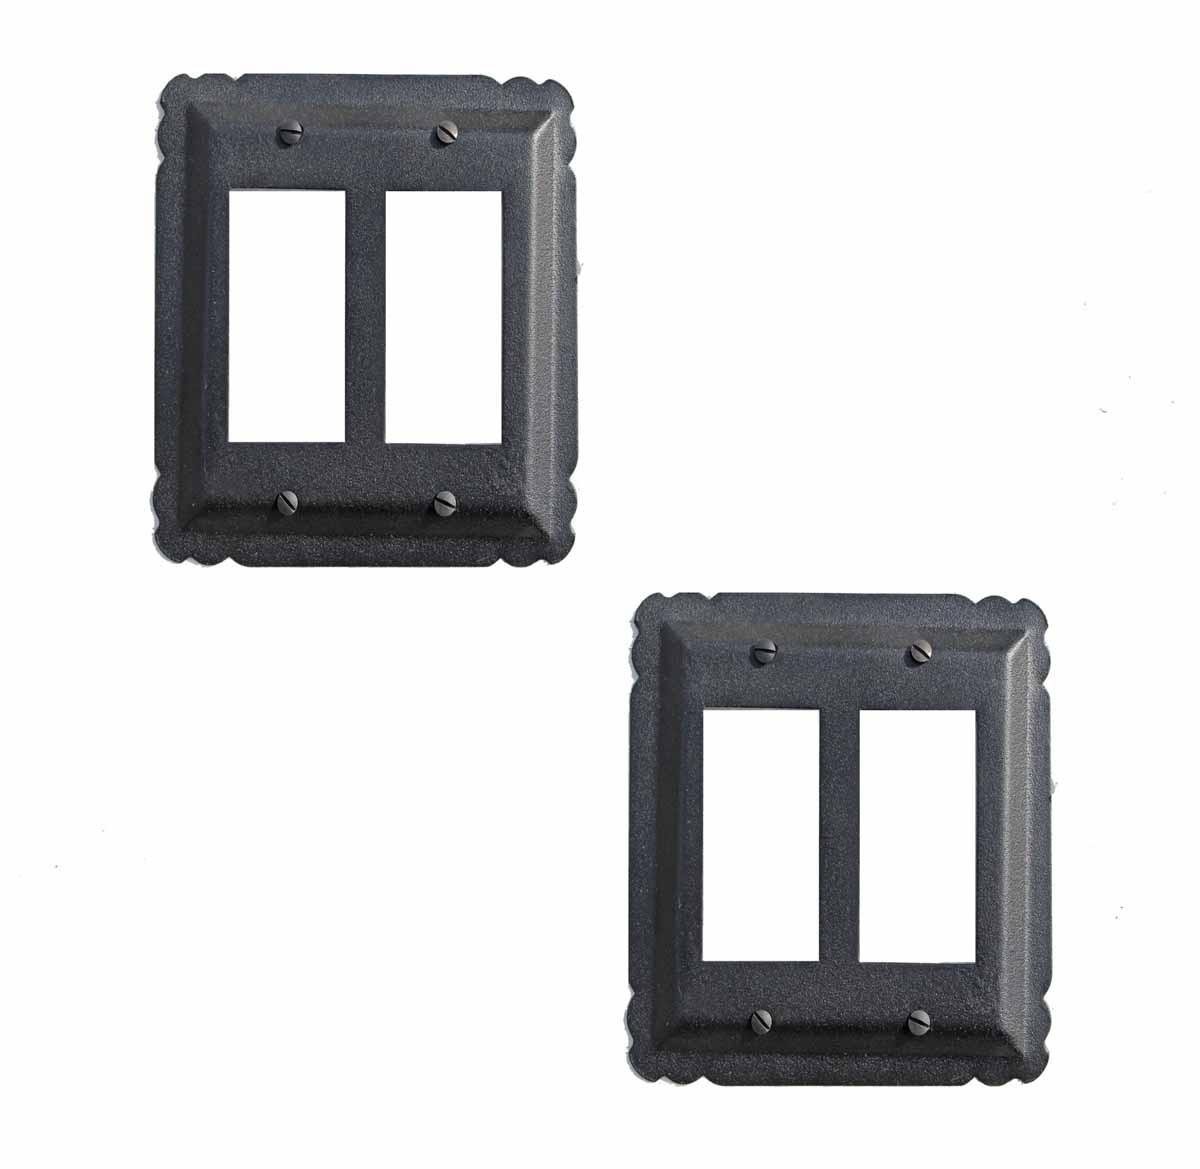 2 Switchplate Black Iron Double GFI | Renovators Supply